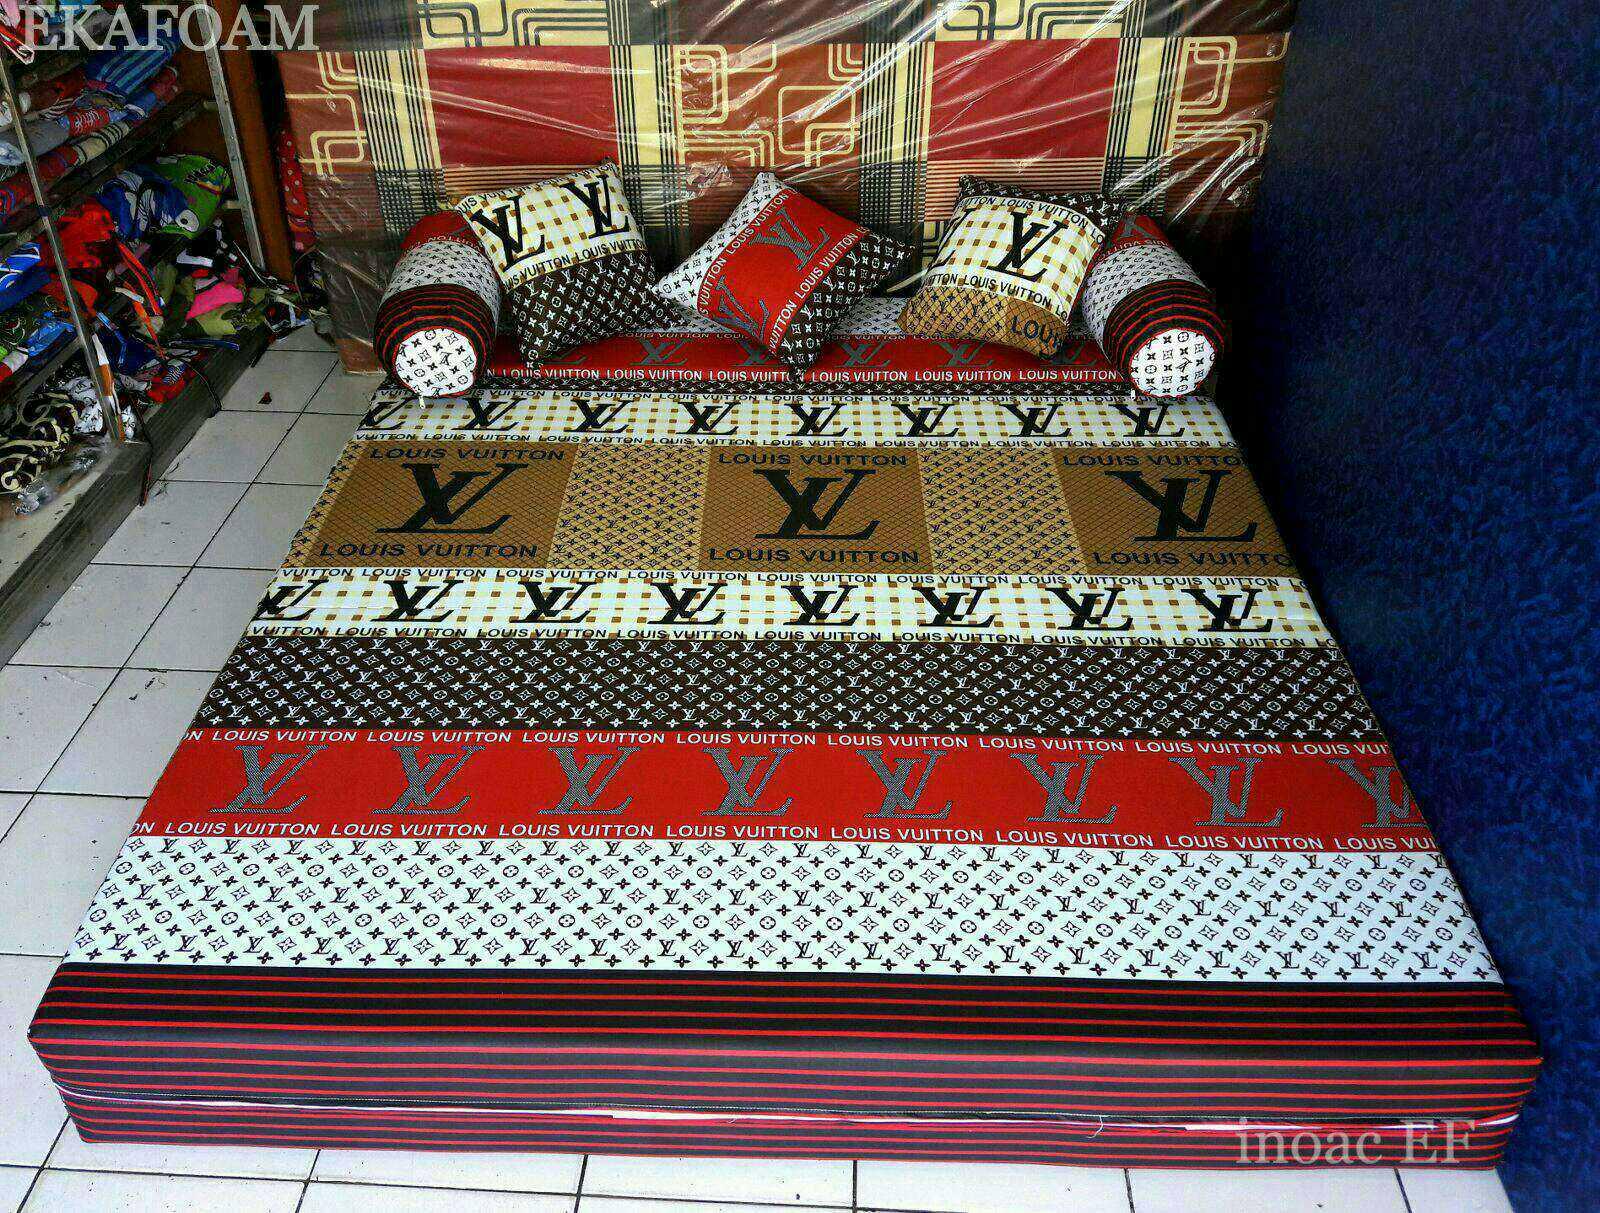 sofa bed inoac 3 in 1 camouflage covers 2017 full motif agen resmi kasur busa